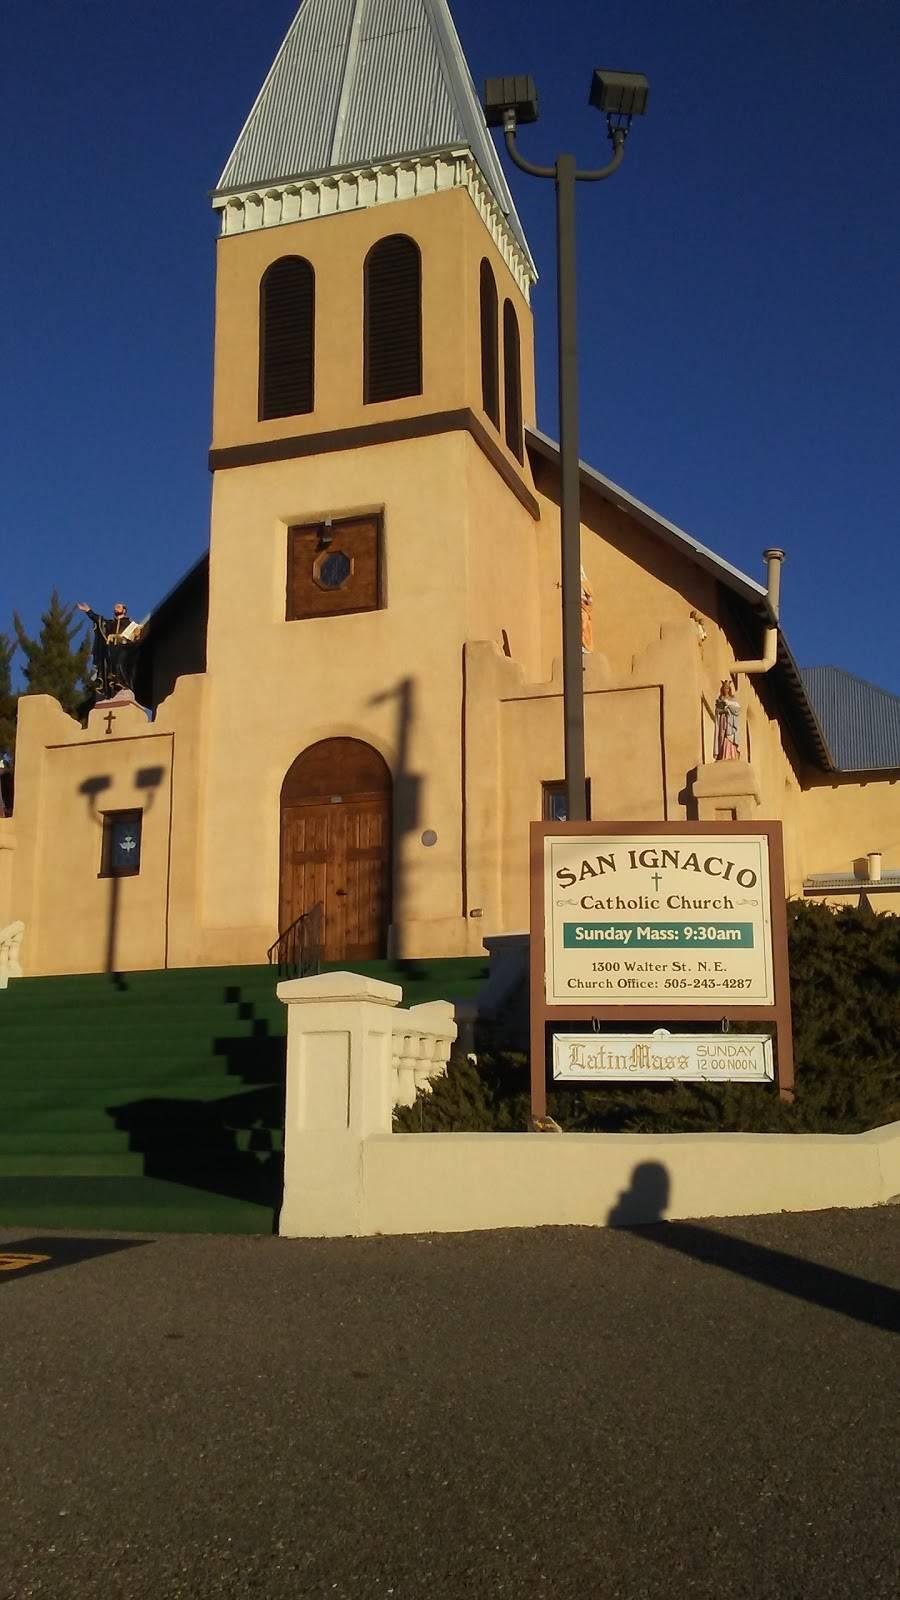 San Ignacio Catholic Church - church  | Photo 5 of 8 | Address: 1300 Walter St NE, Albuquerque, NM 87102, USA | Phone: (505) 243-4287